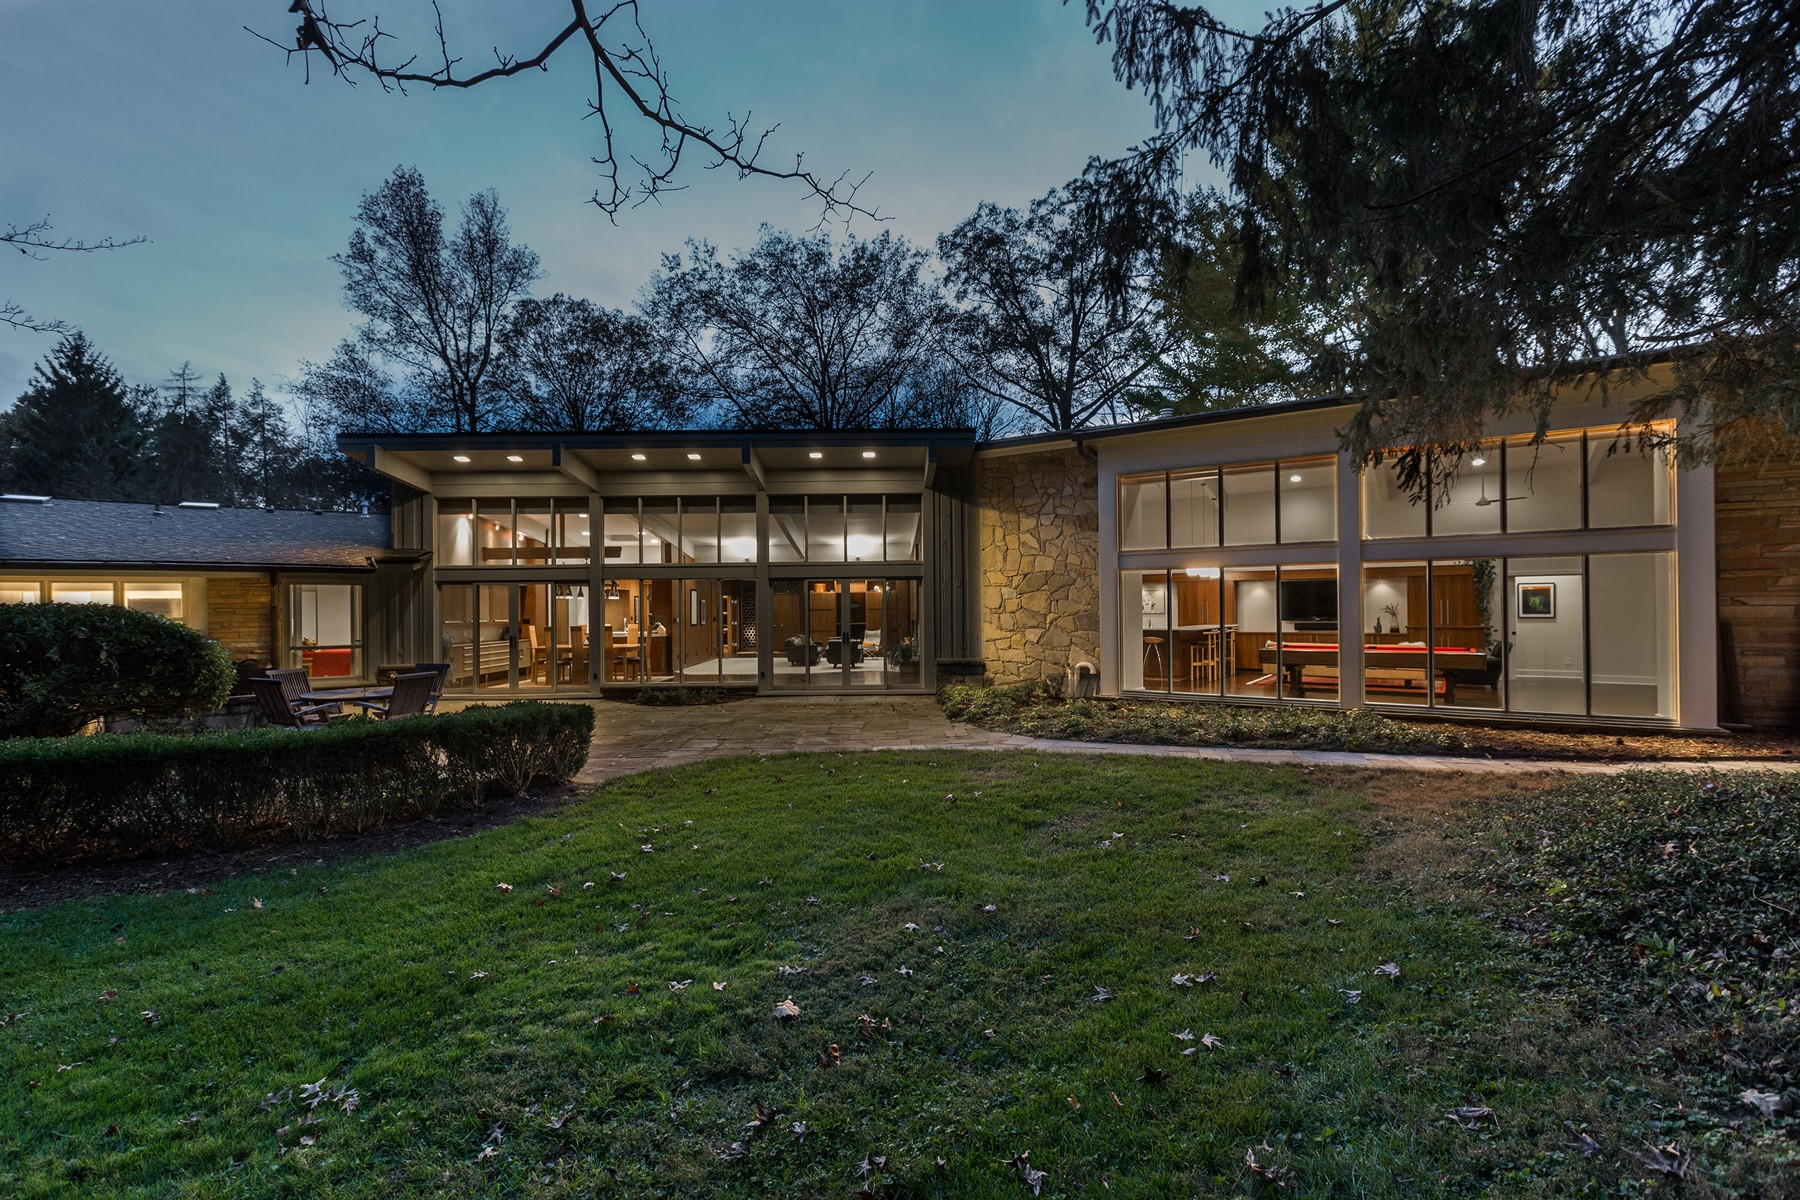 獨棟家庭住宅 為 出售 在 A Work of Art 215 Williams Drive Indianapolis, 印第安那州, 46260 美國